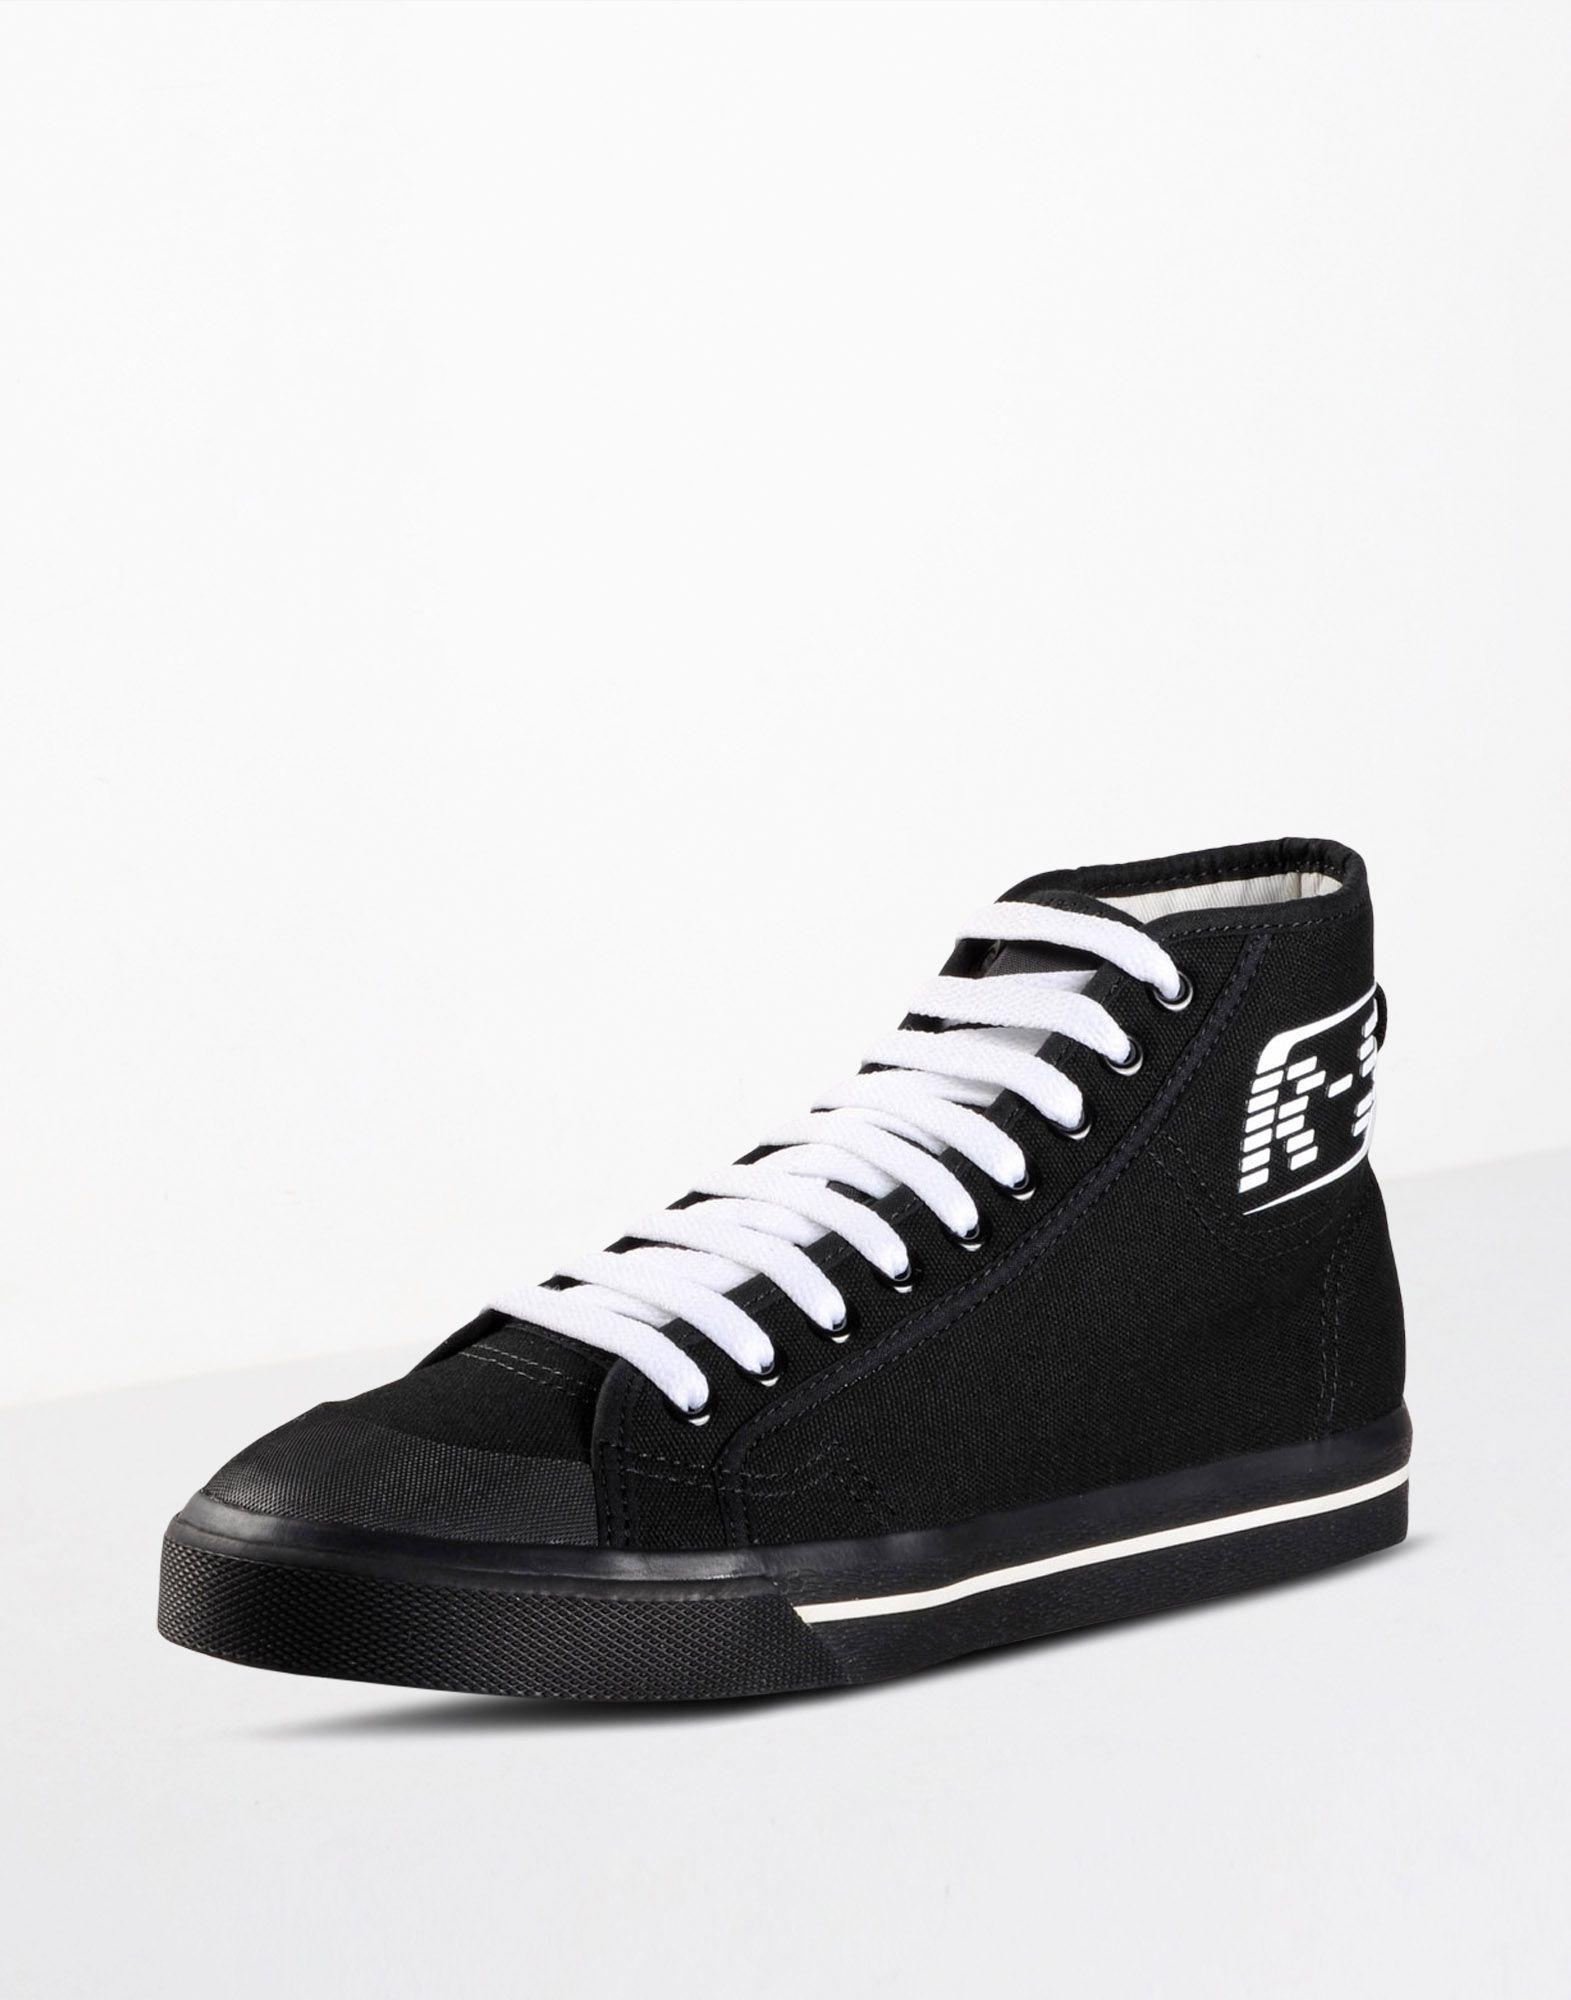 adidas Spirit High sneakers 1Of8tnMCo